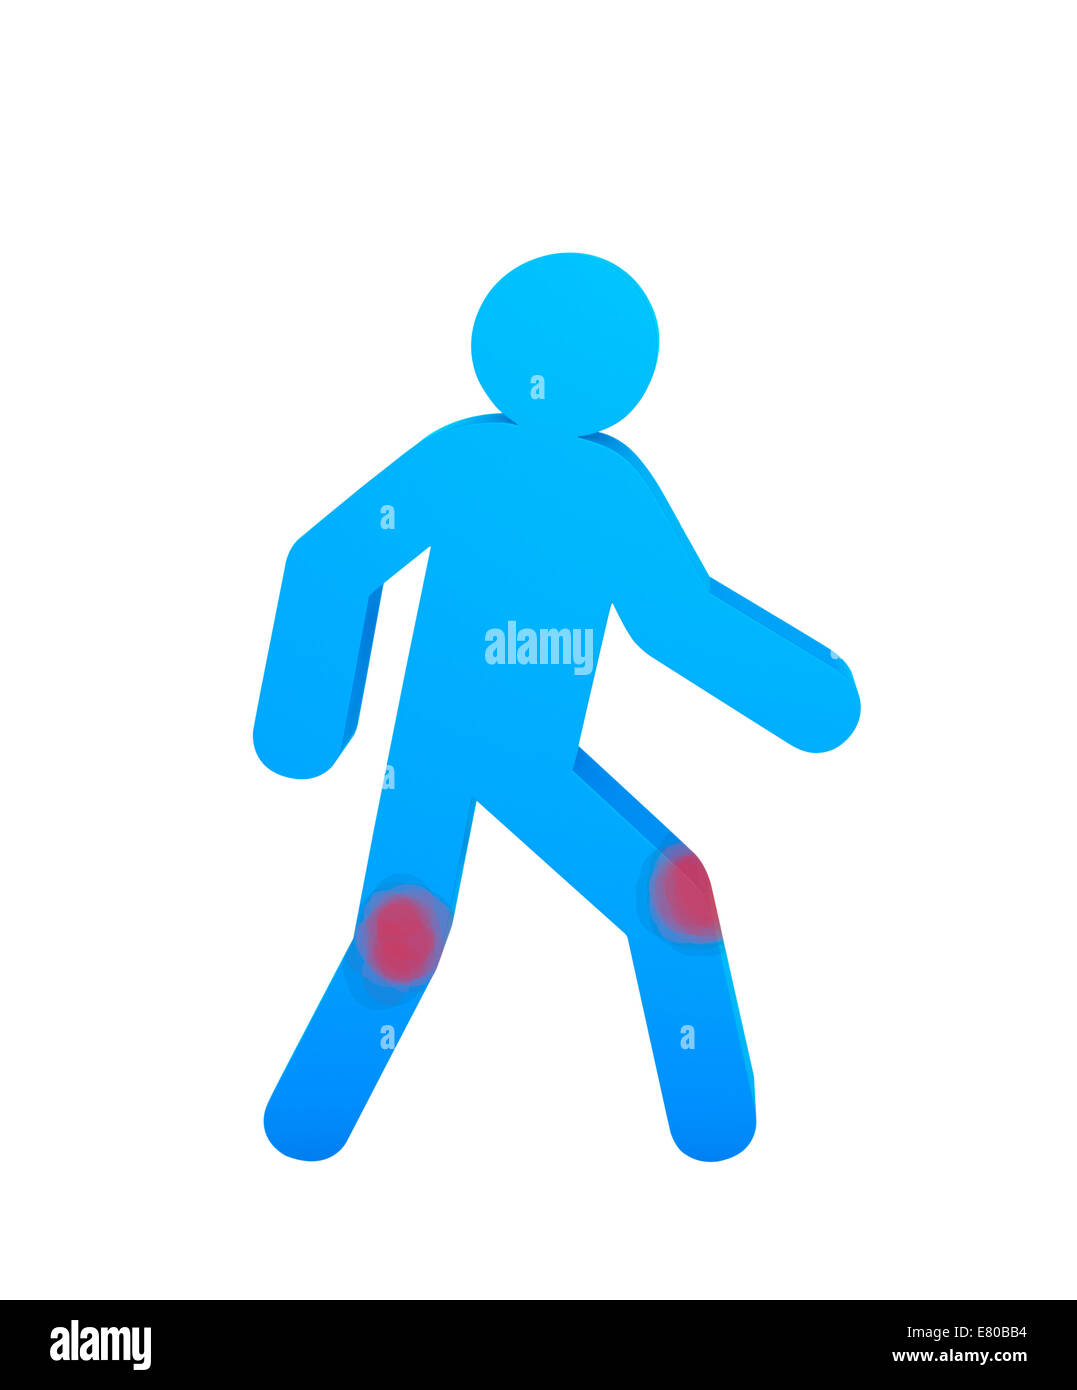 Human knee pain - Stock Image